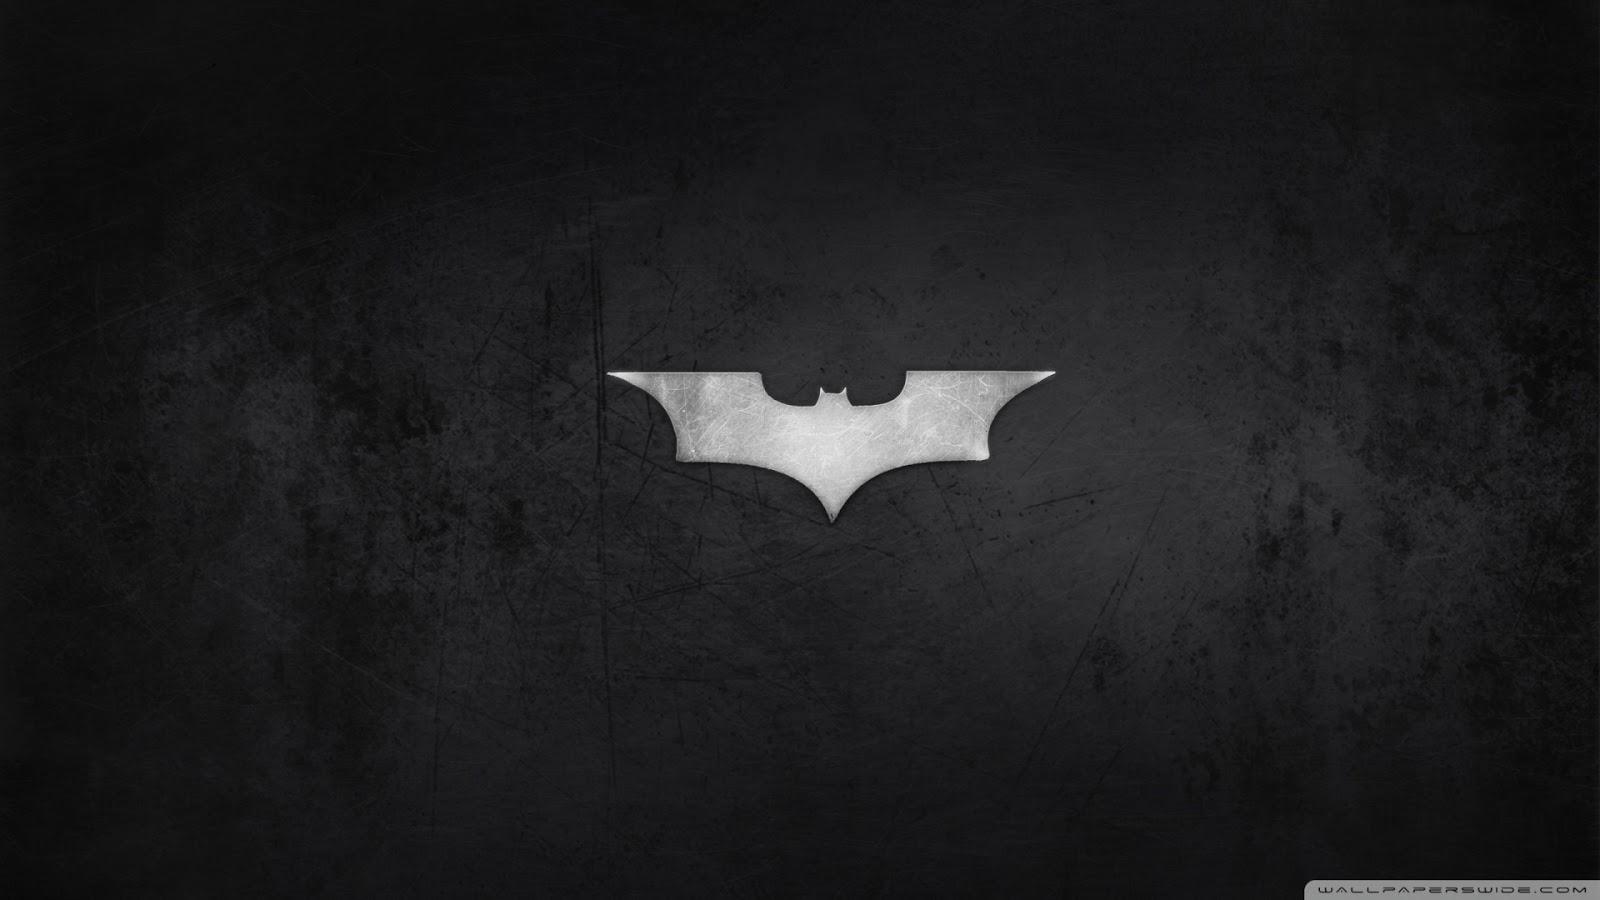 fond dcran batman hd gratuit - Batman Gratuit